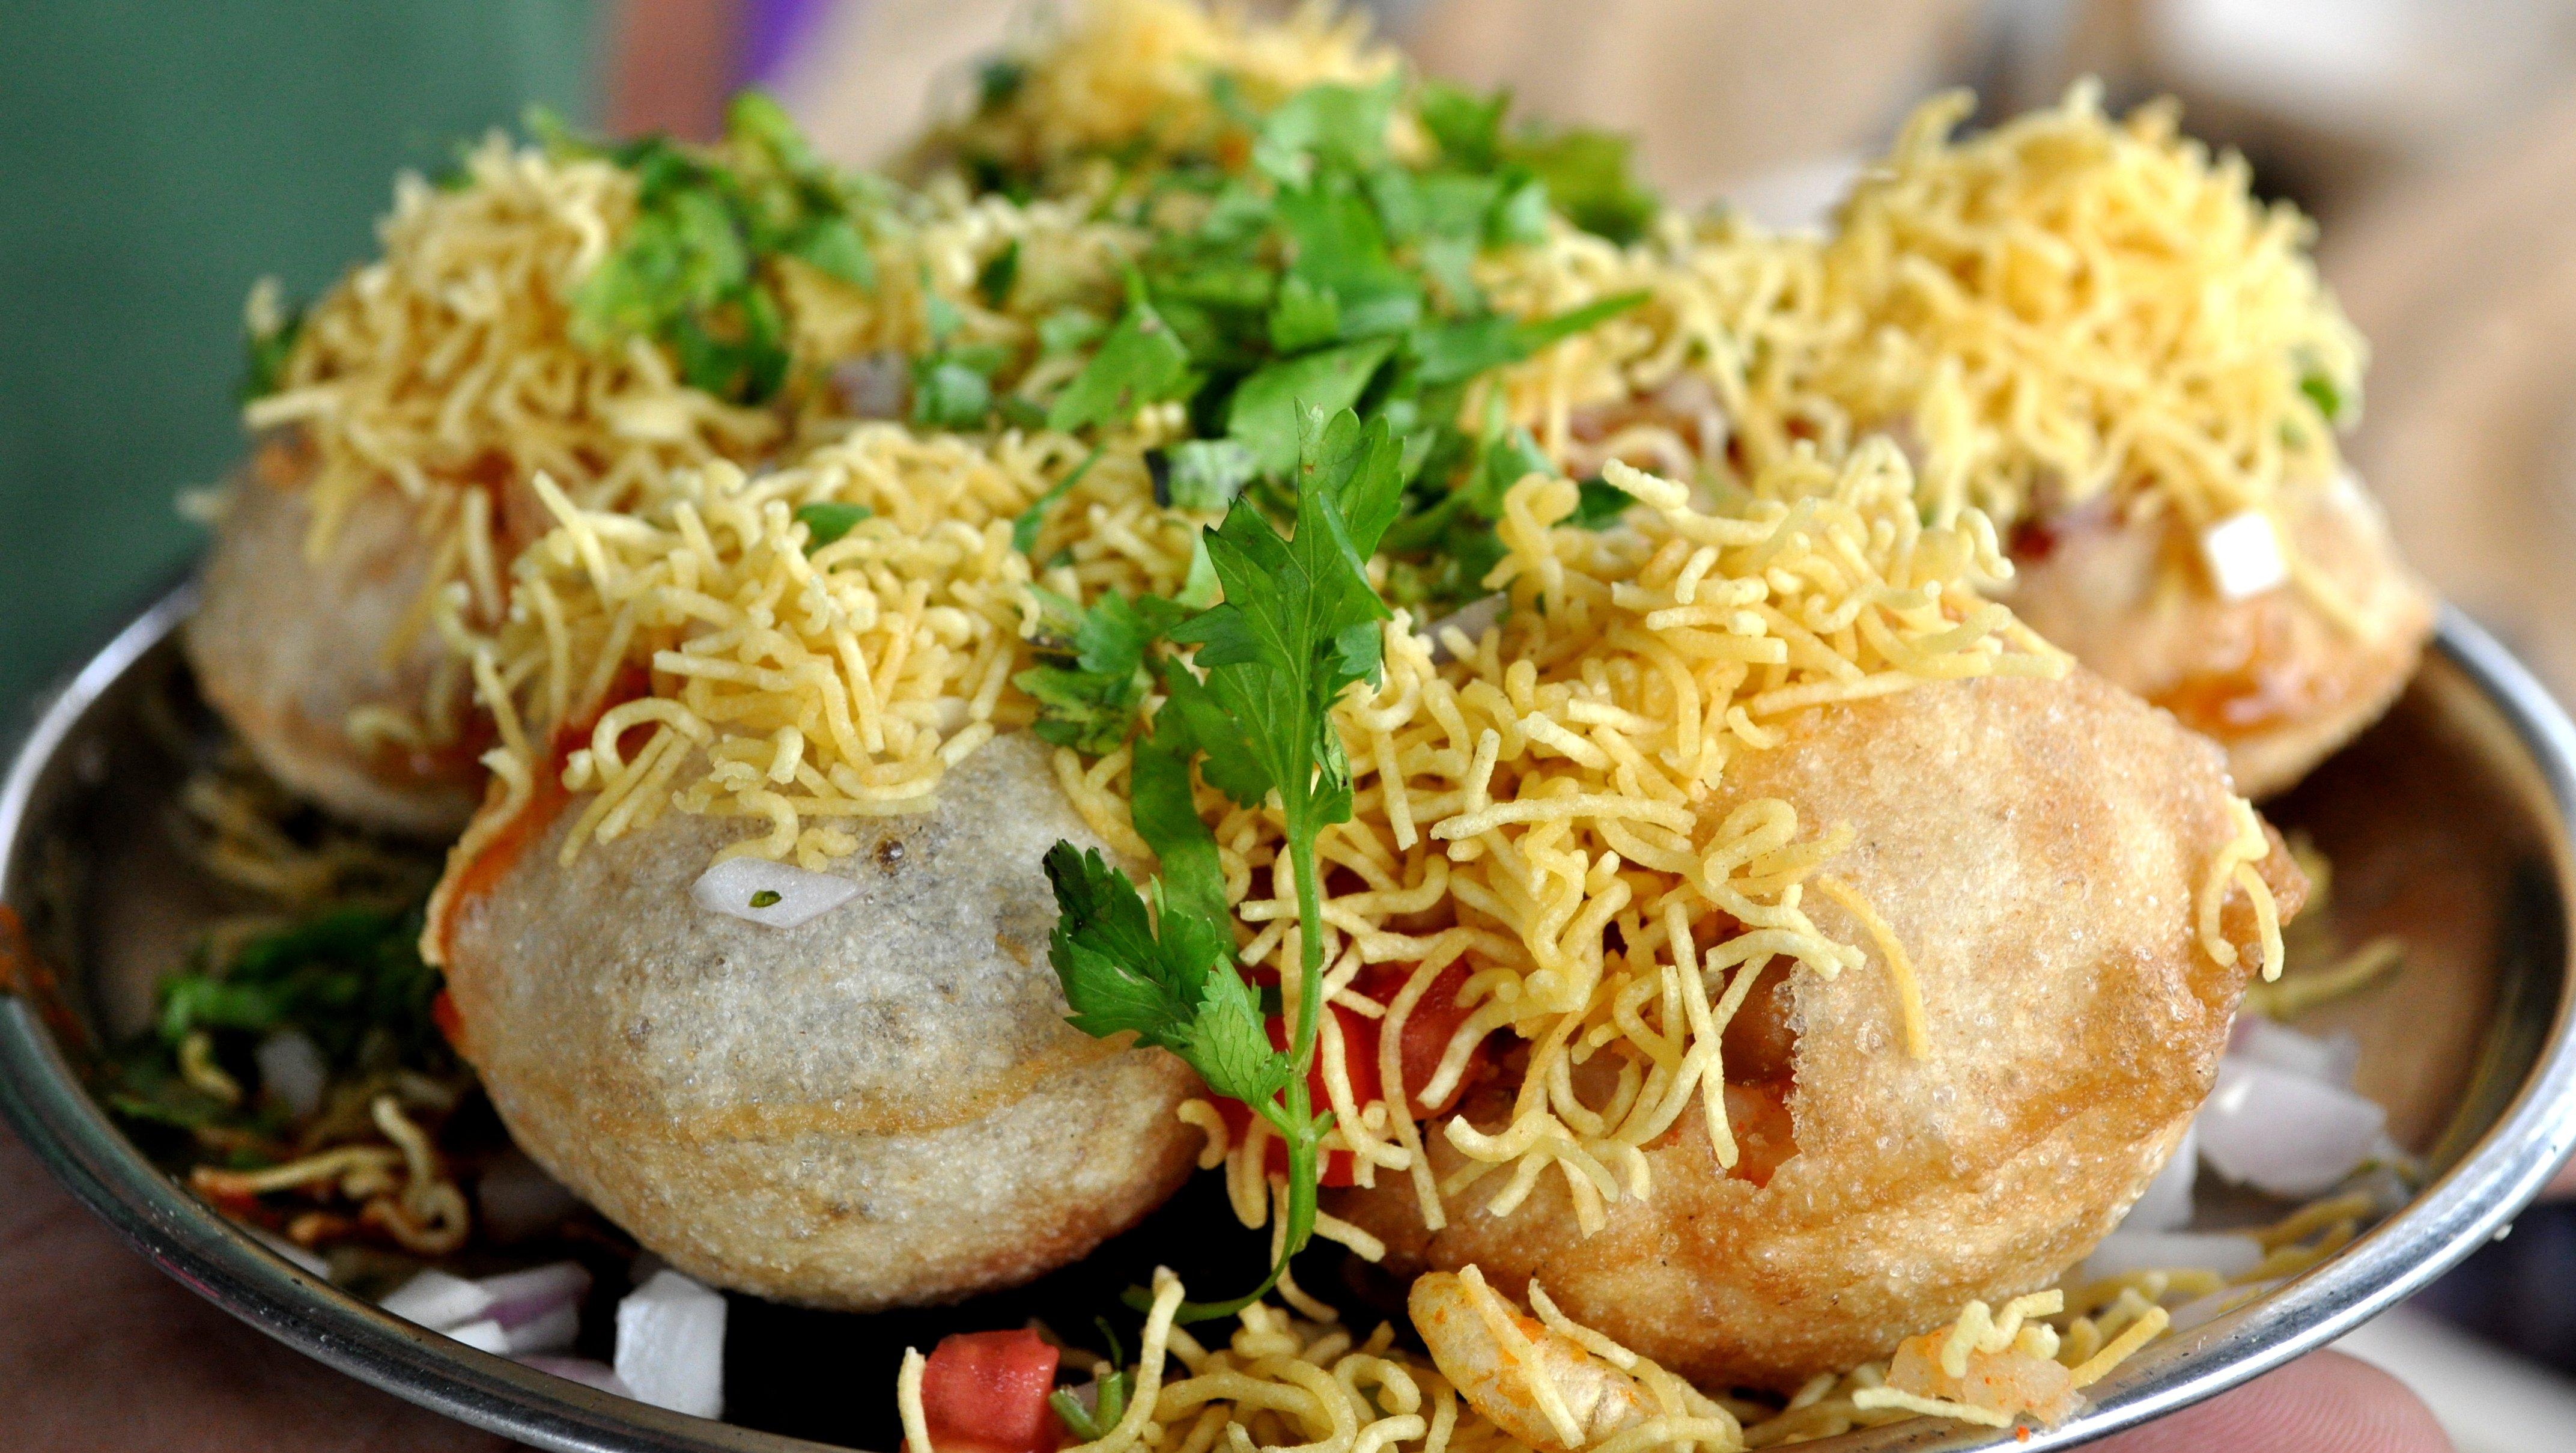 Mumbai Street Food: 10 Of The Best Things To Eat